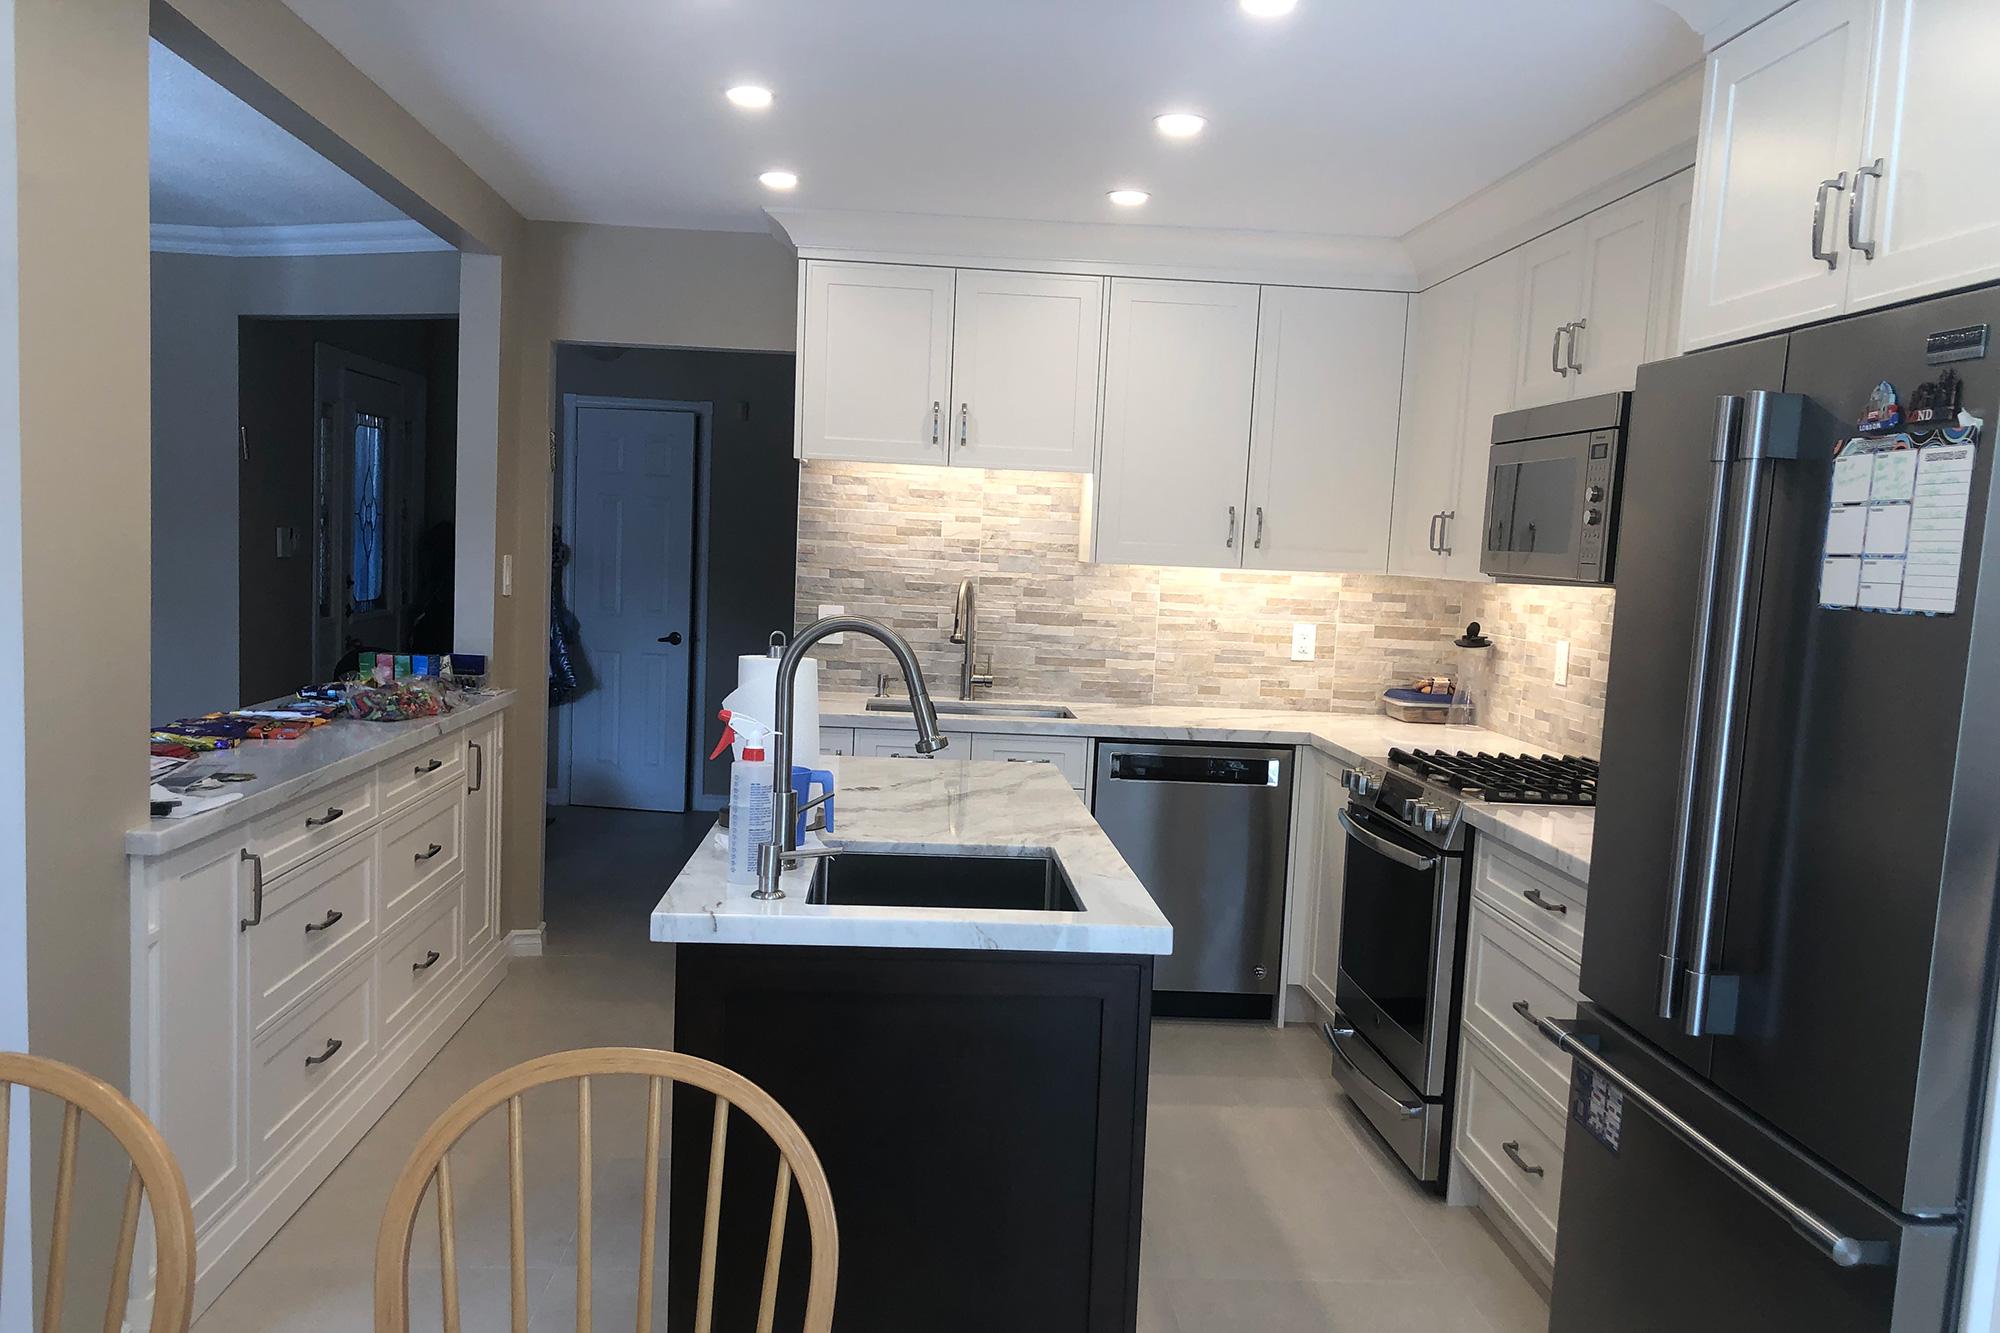 homewise-innovations-kitchen-renovation-thornhill-main